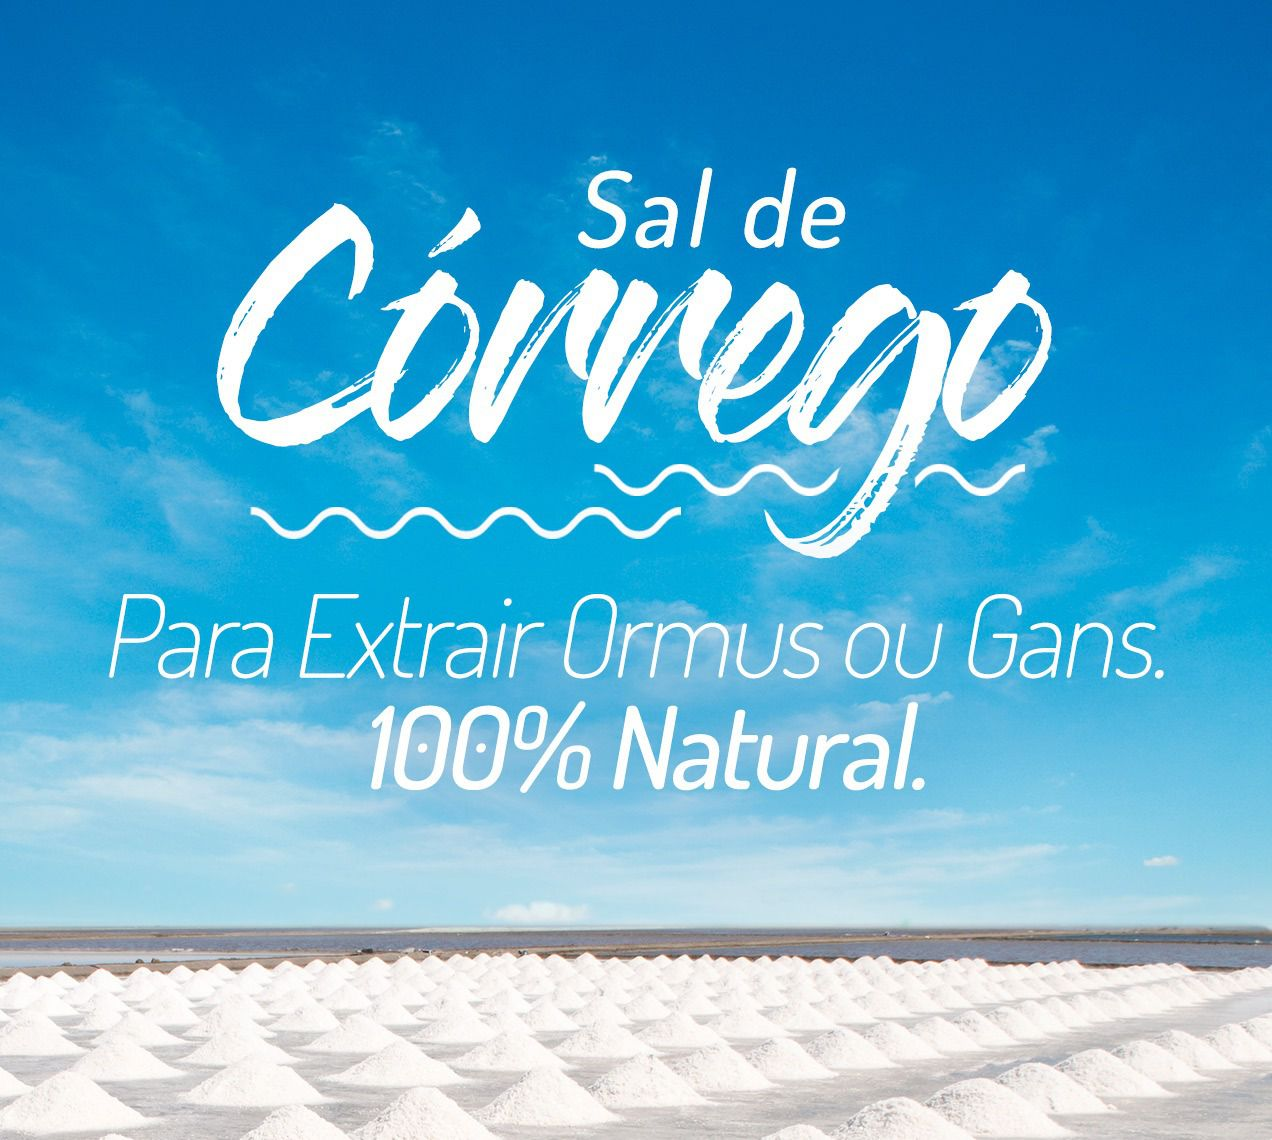 Sal De Córrego - Para Extrair Ormus / Gans -20kg